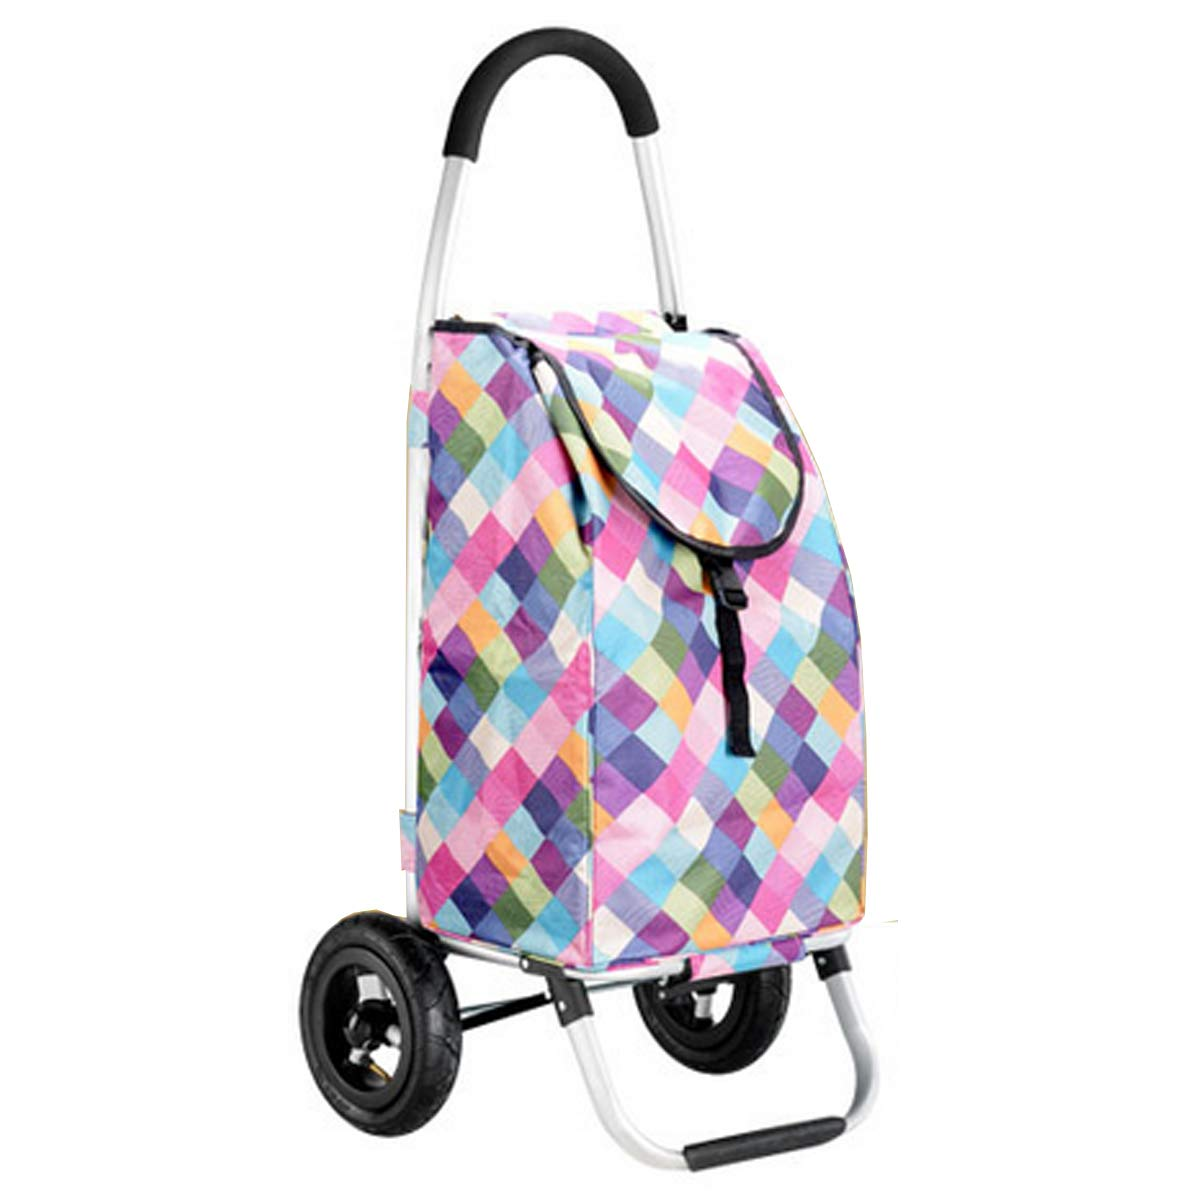 YGUOZ 折りたたみ ショッピングカート 買い物カート、エコ 買い物キャリーと取り外し可能なバッグ、買い物カート 軽量(35L),Colored grid  Colored grid B07MMP8TL6